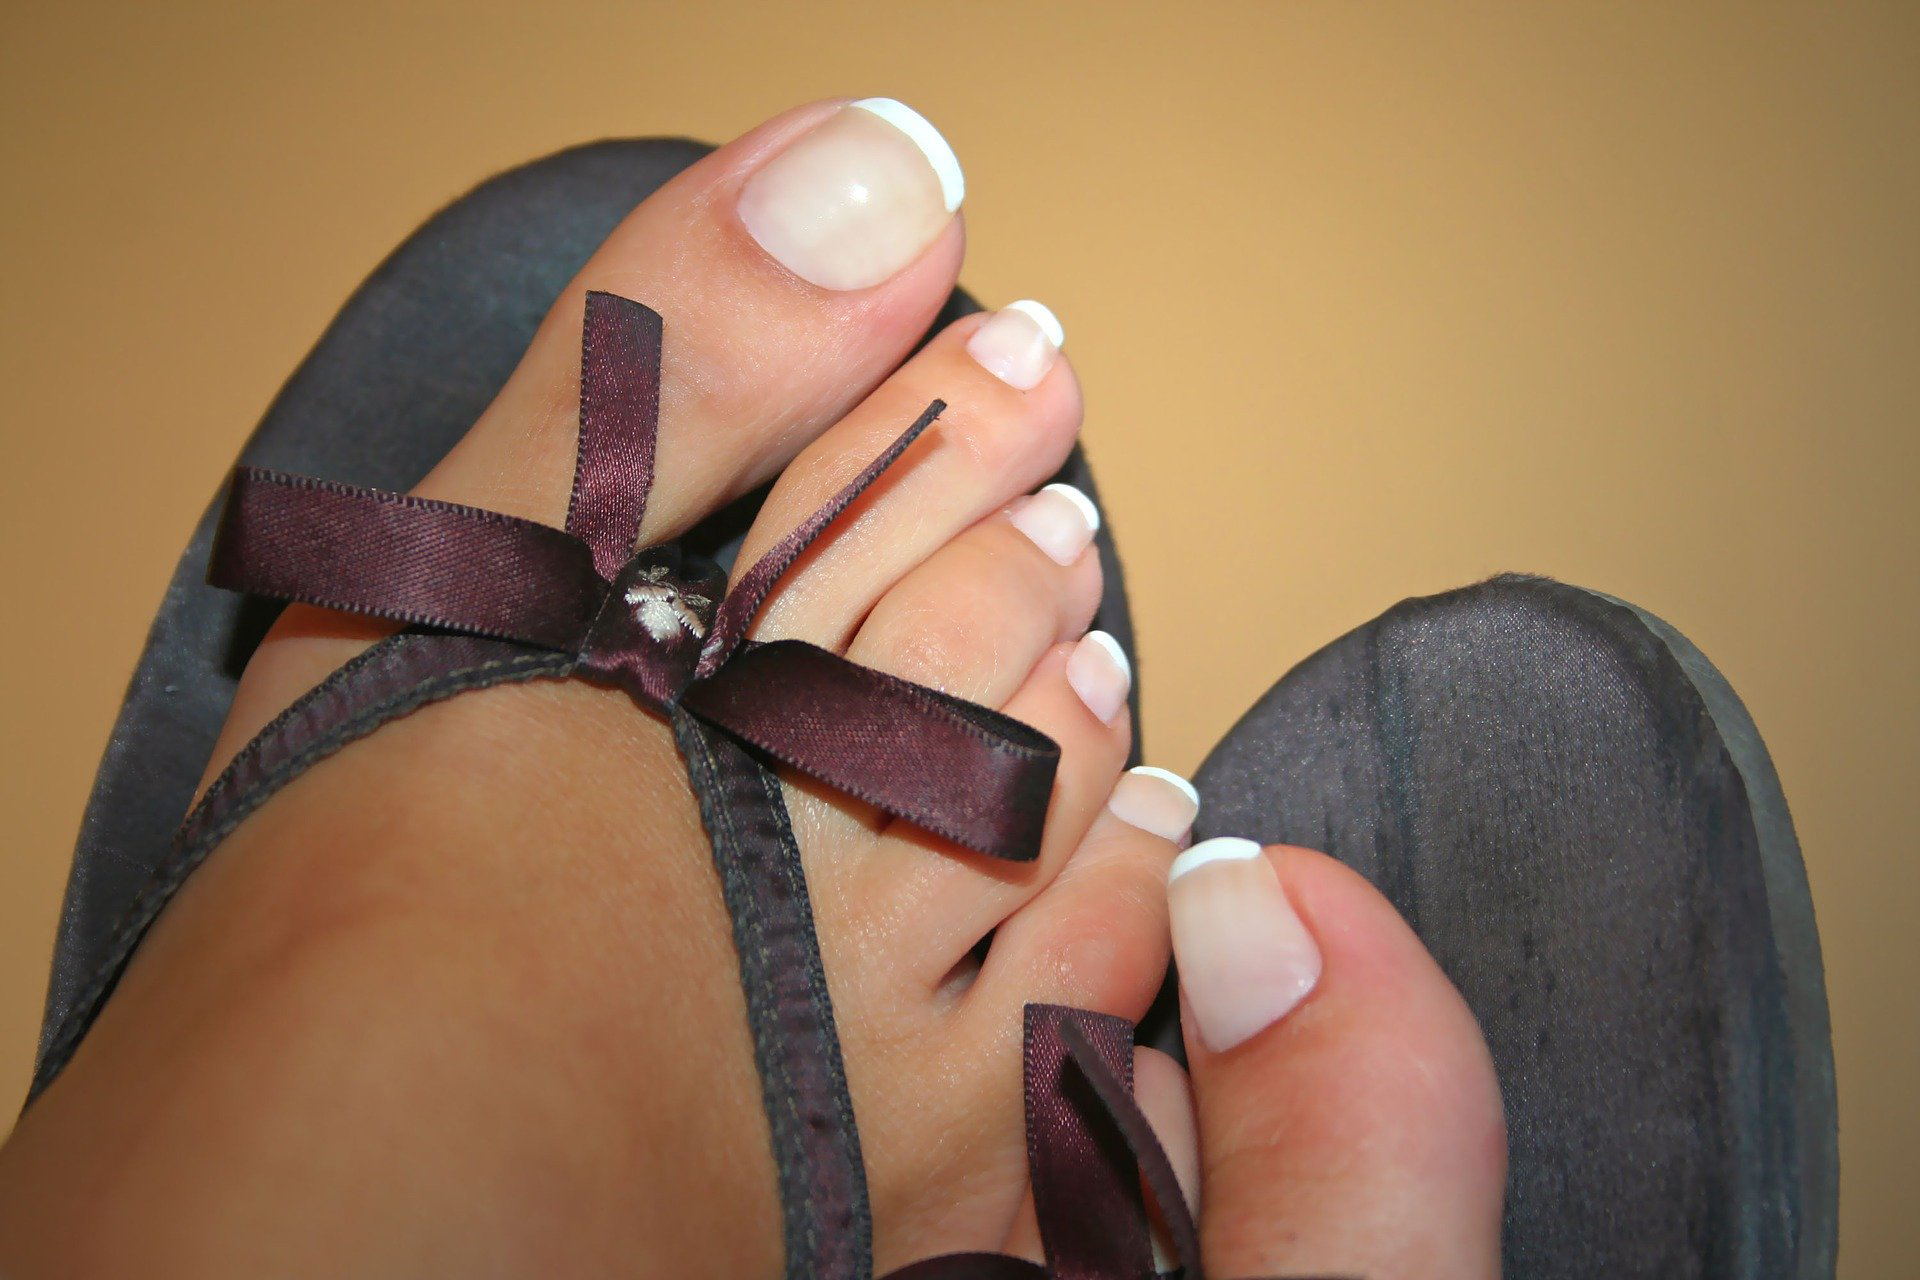 vernis mycose des pieds